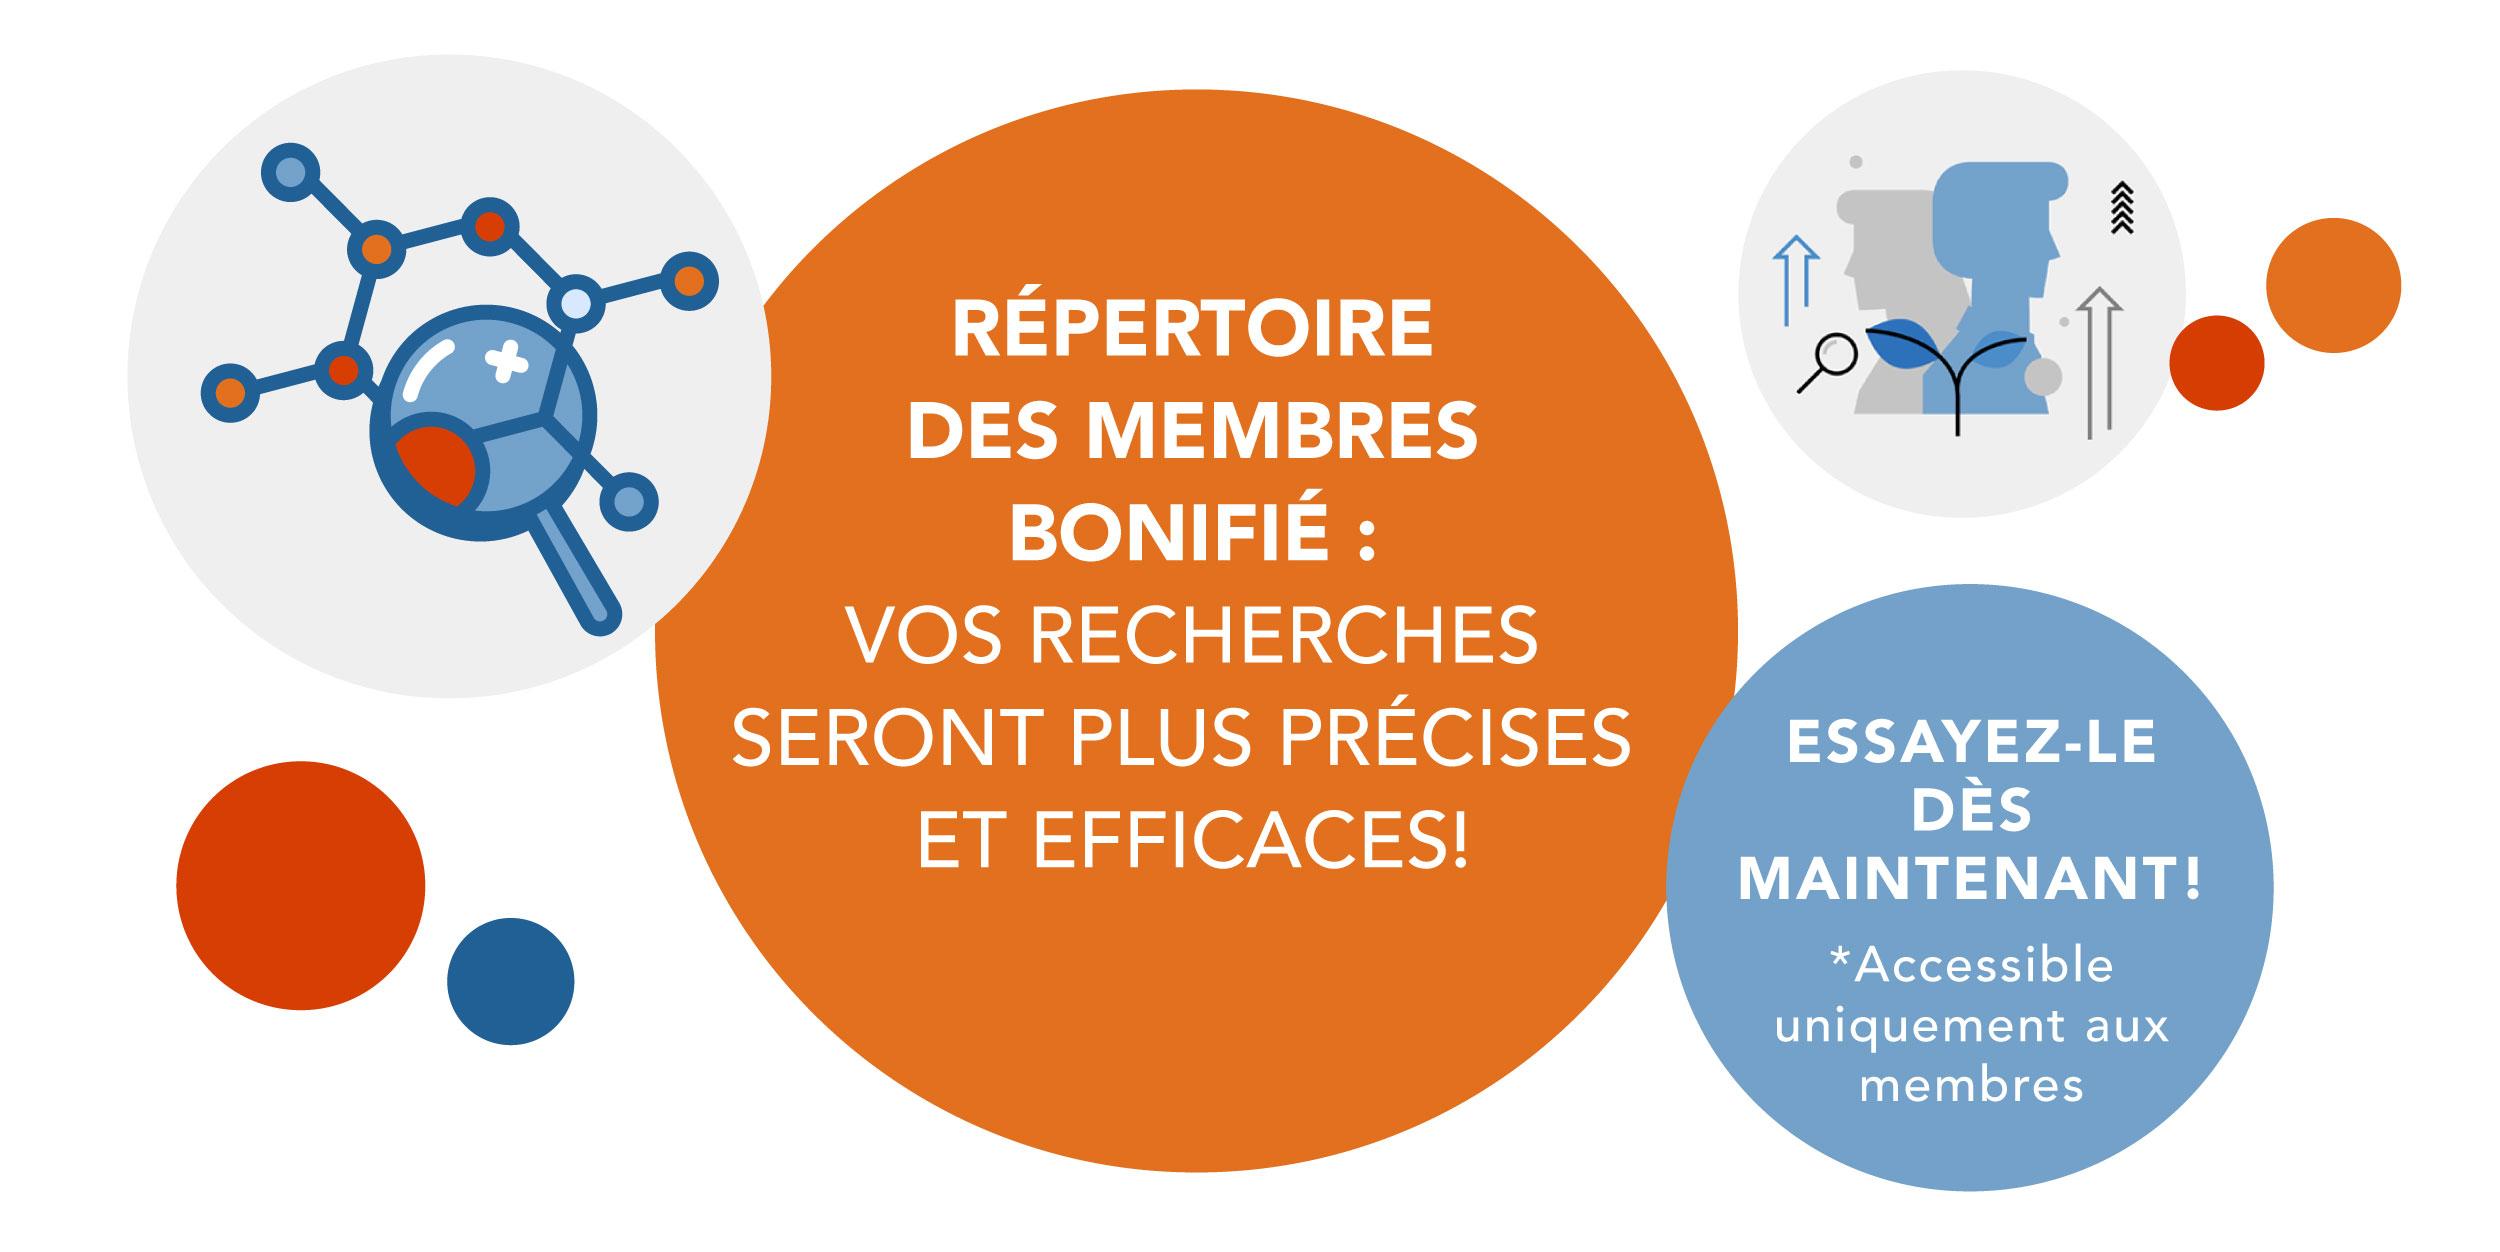 RepertoireMembres.jpg